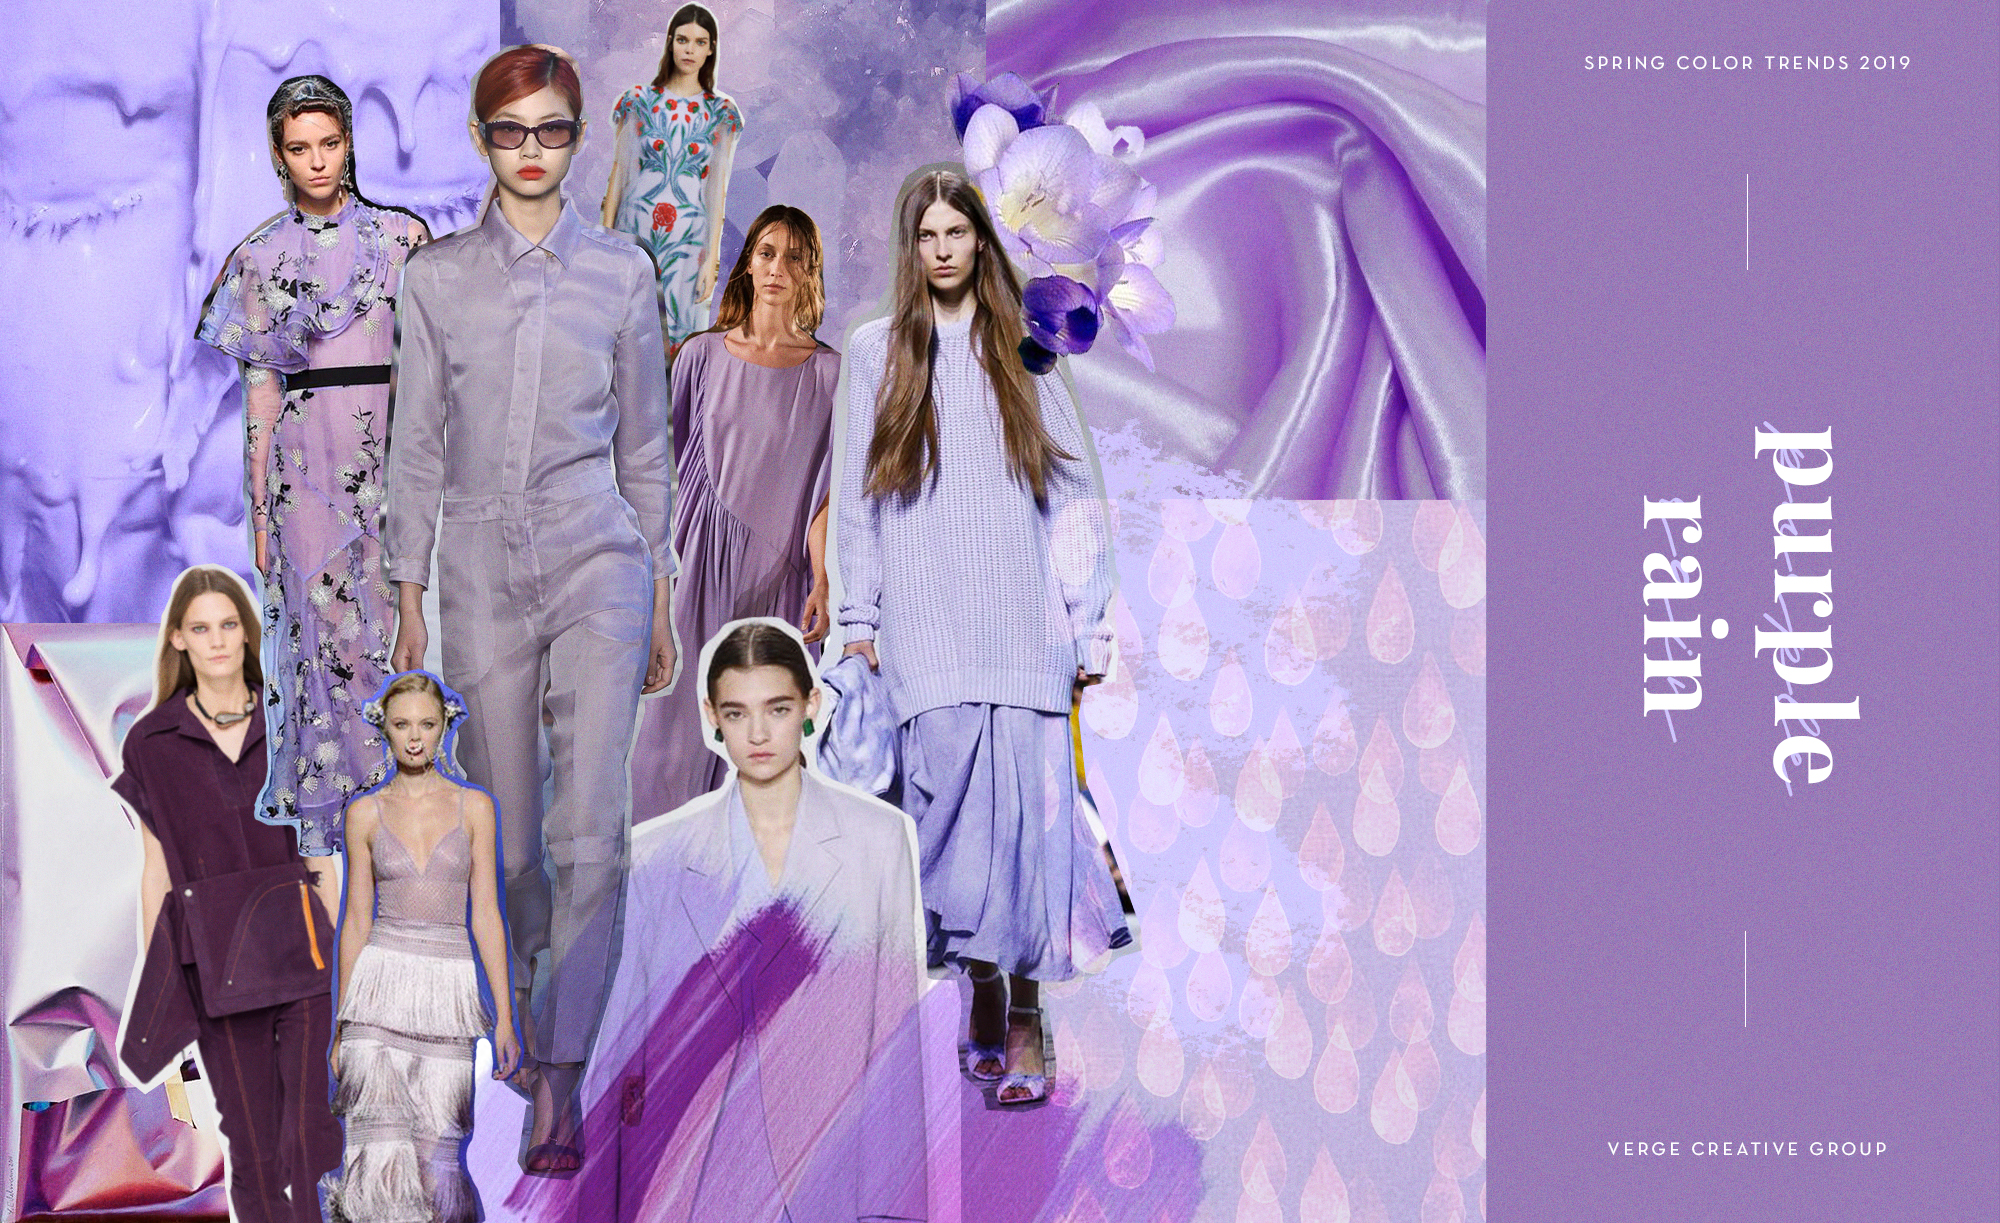 verge-creative-group-spring-color-trends-purple-rain.jpg